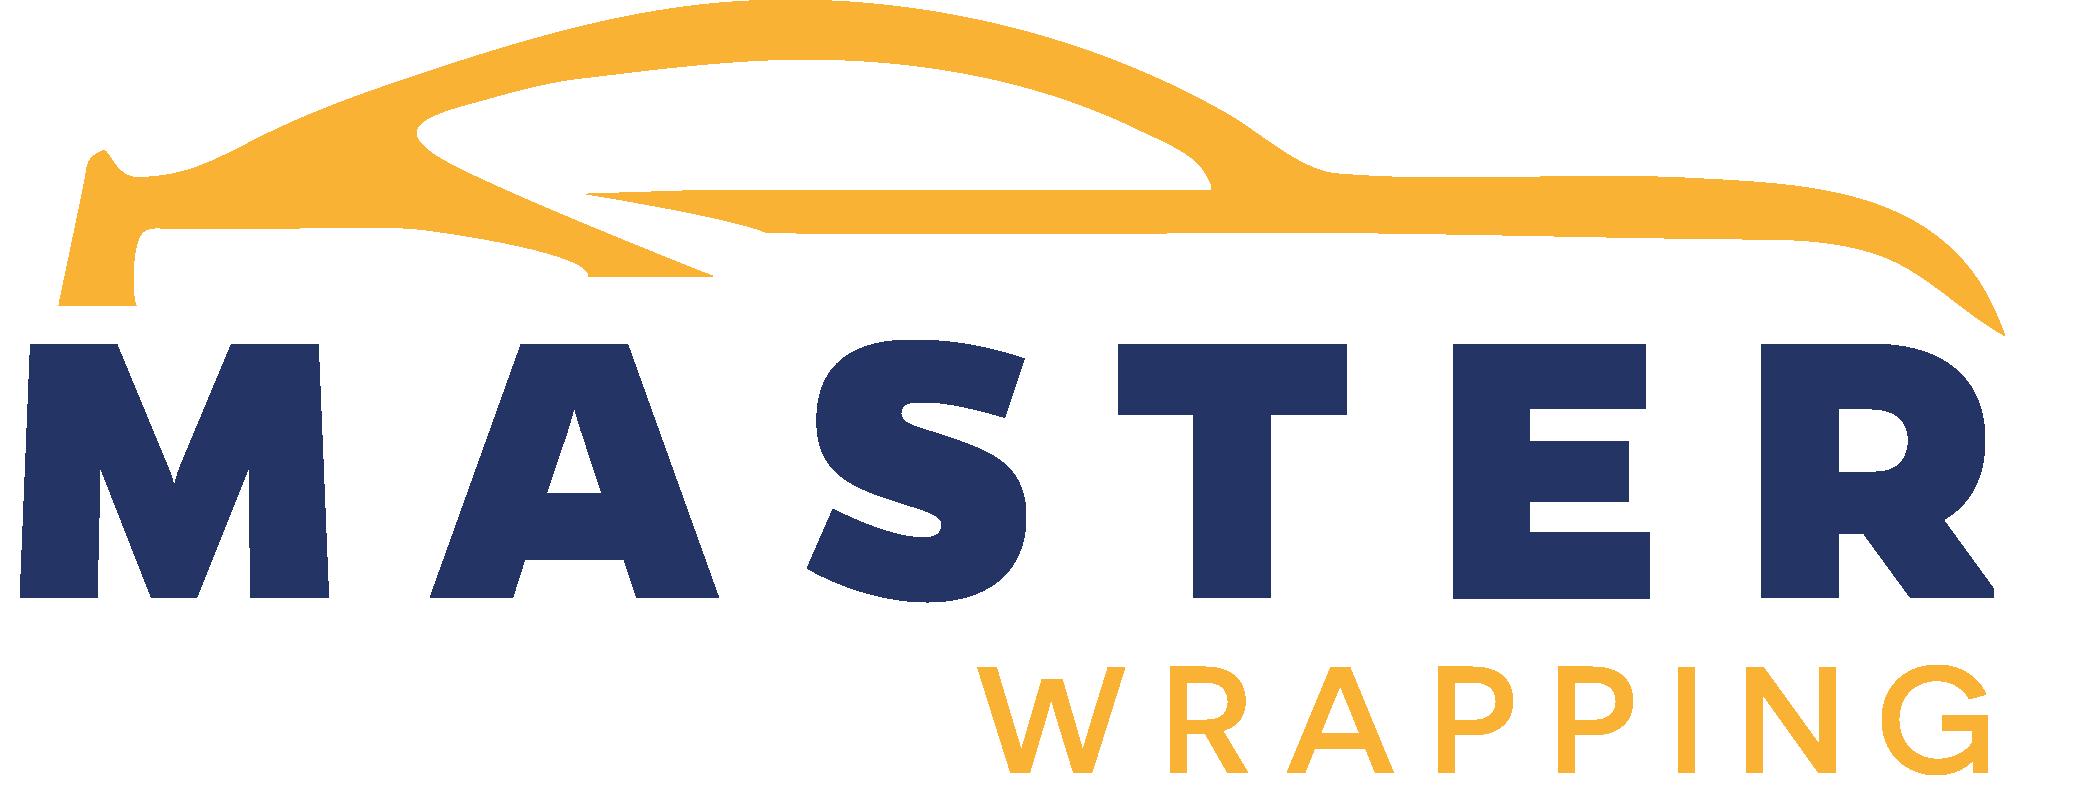 masterwrapping logo